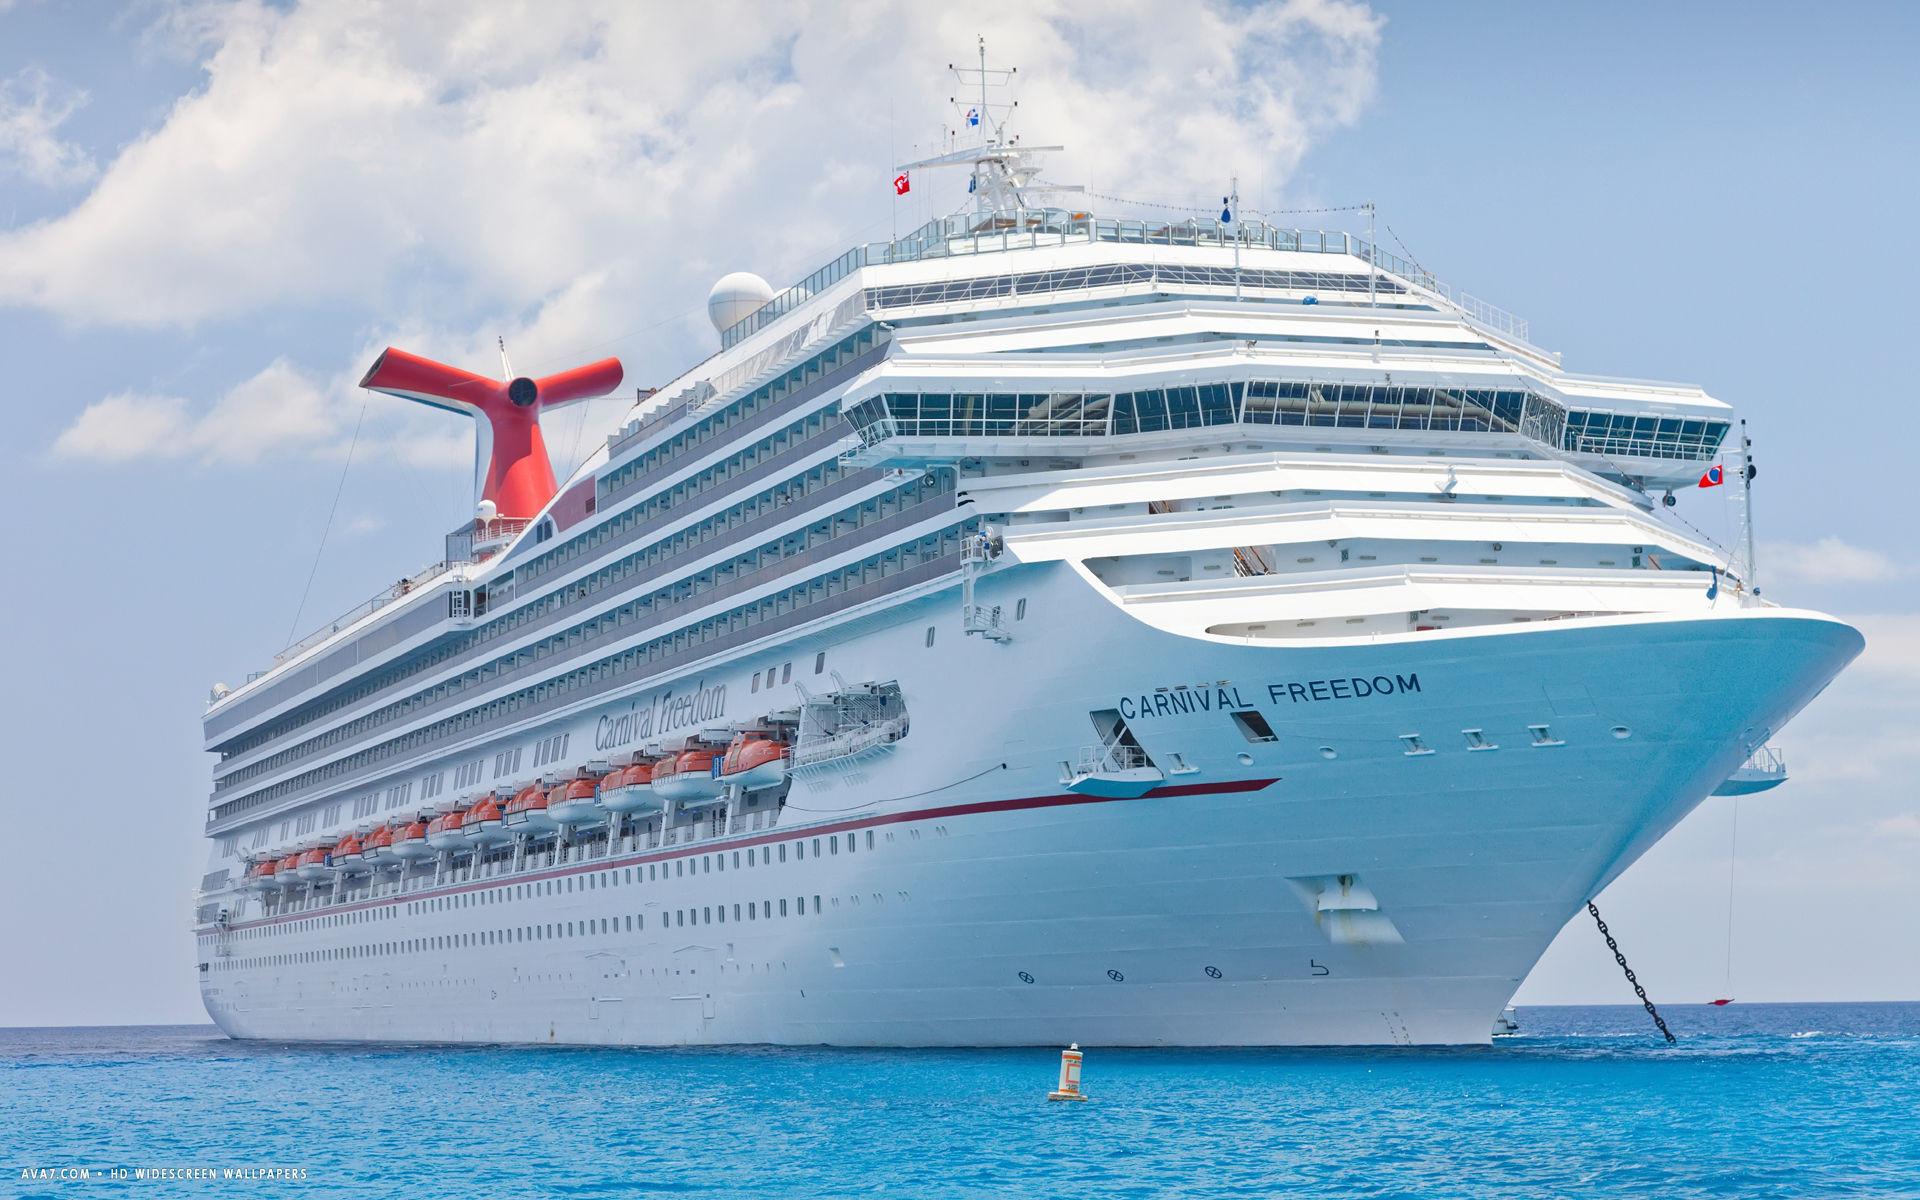 carnival freedom cruise ship hd widescreen wallpaper